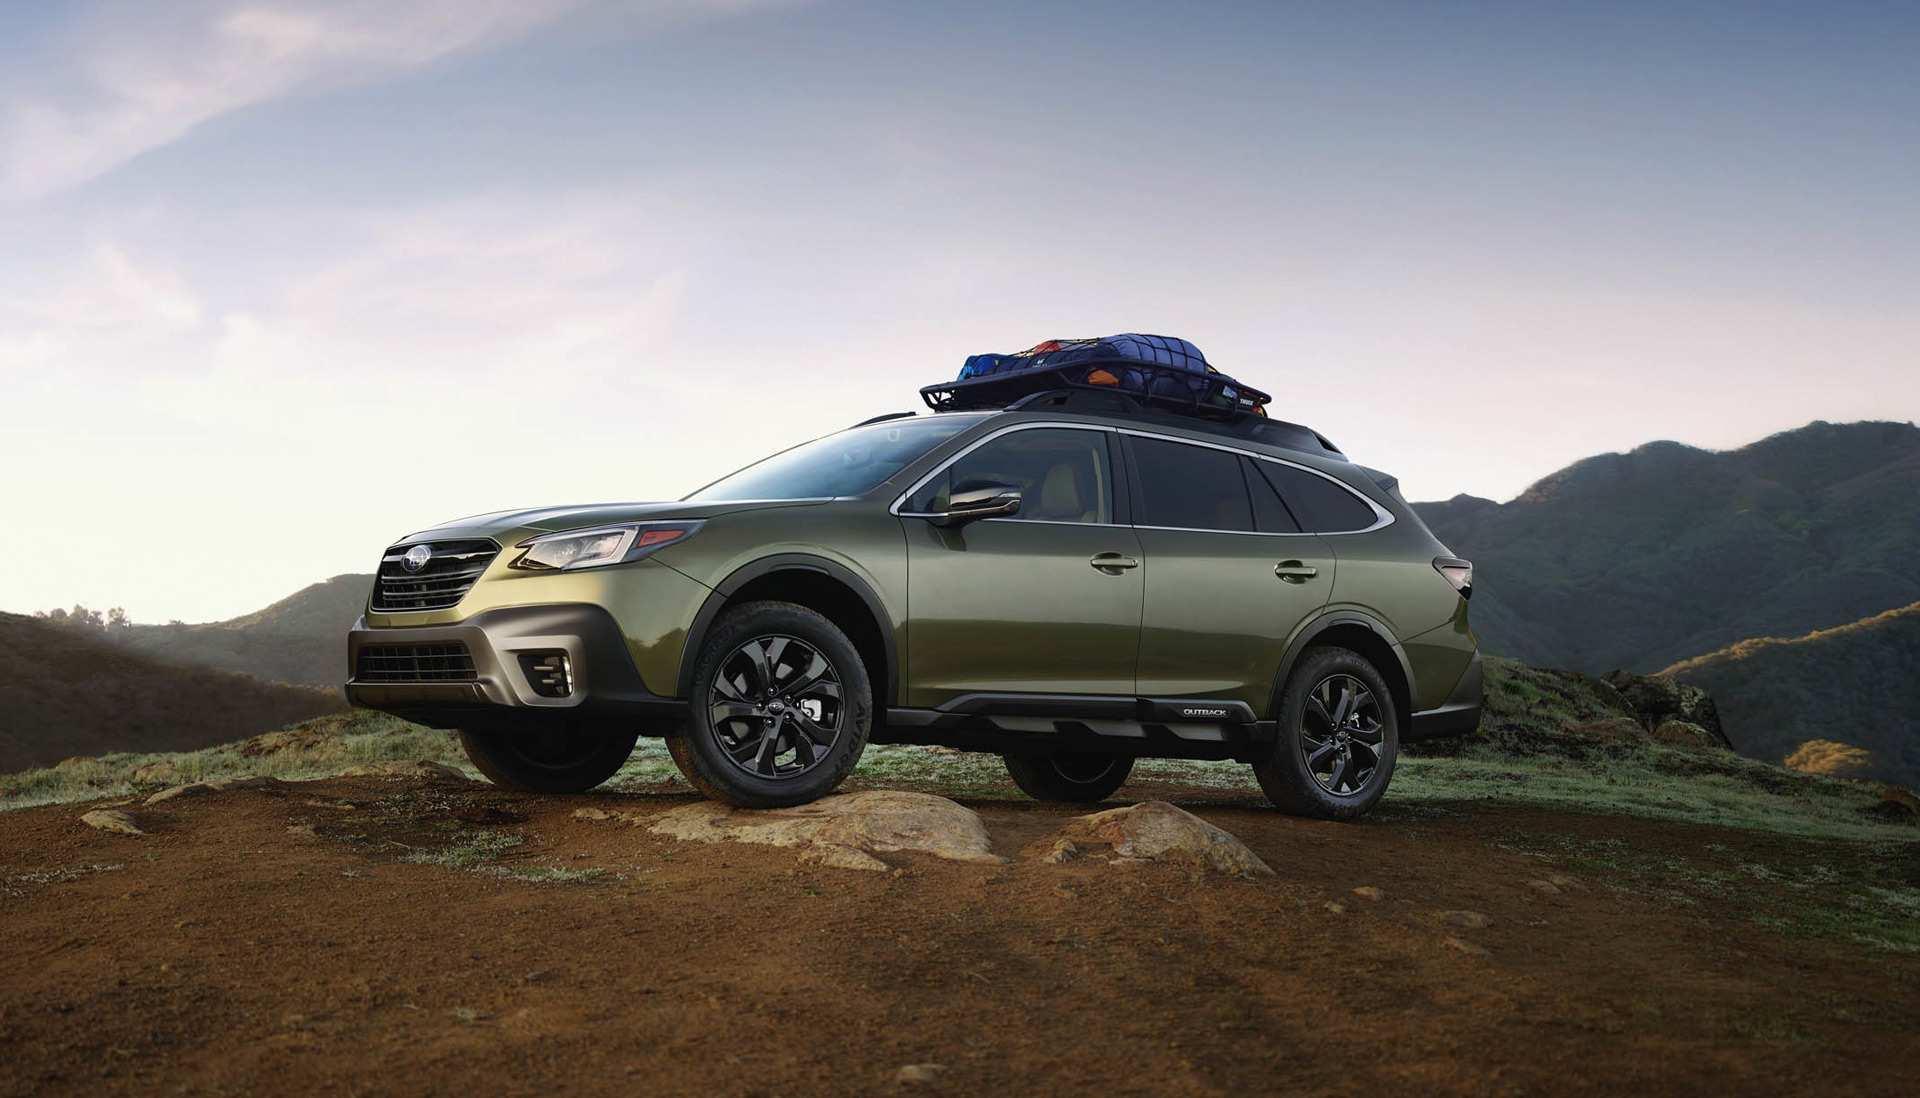 36 Great 2020 Subaru Outback Jalopnik Price and Review by 2020 Subaru Outback Jalopnik